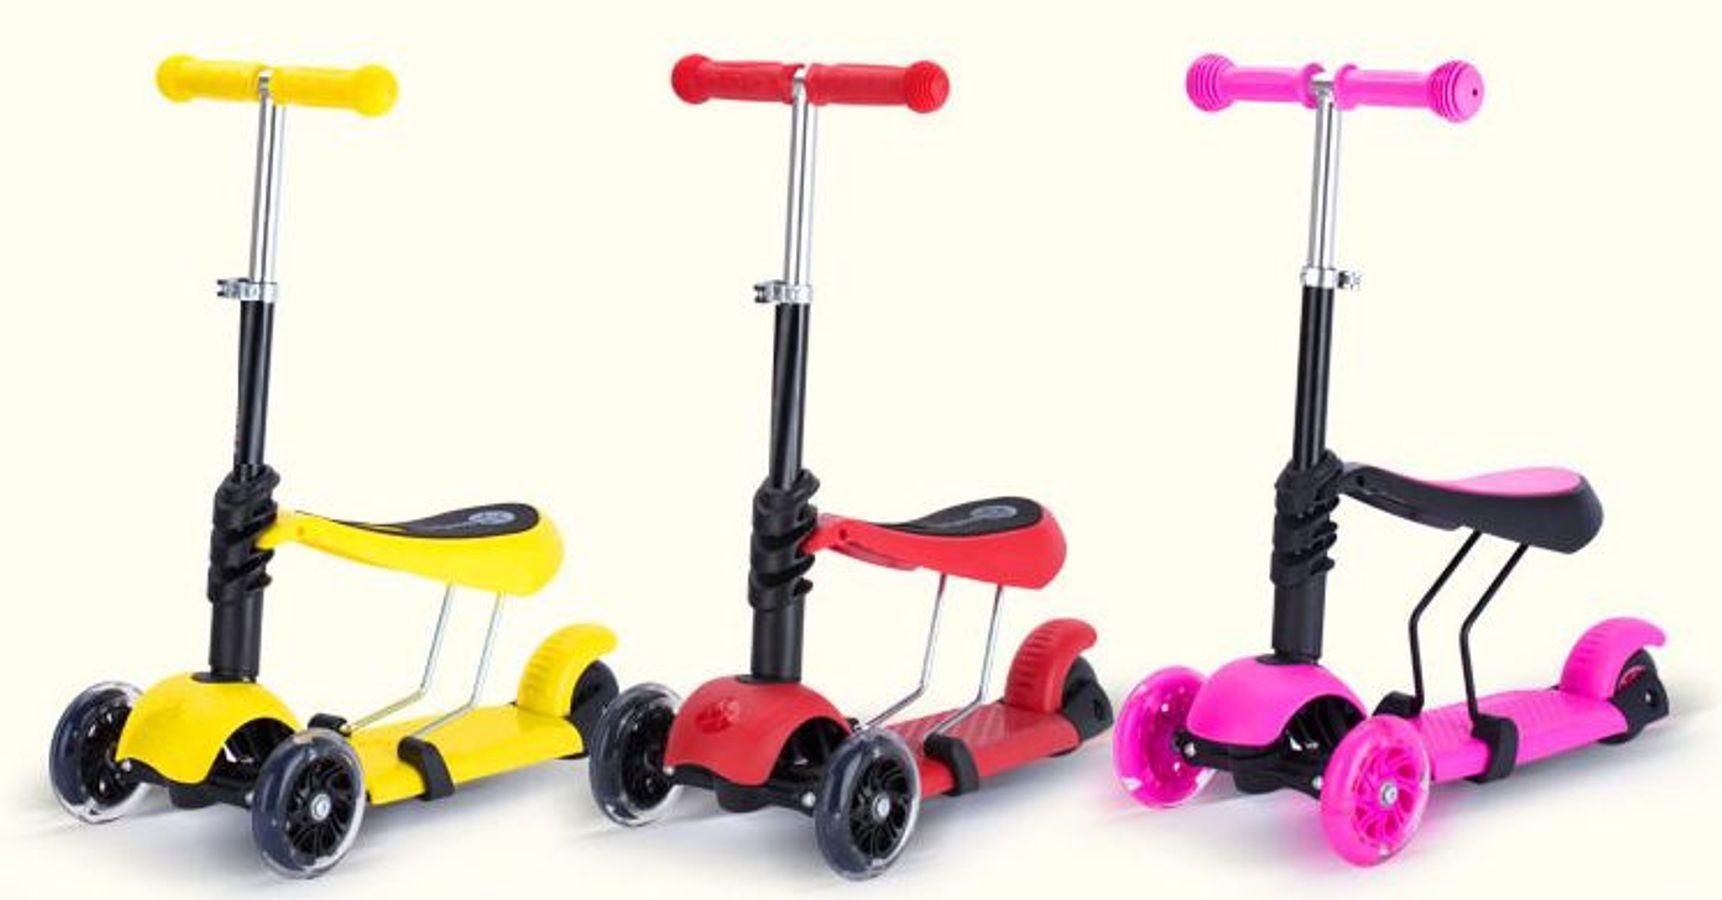 Xe Trượt Scooter 3 In 1 SC31 Cho Trẻ Em